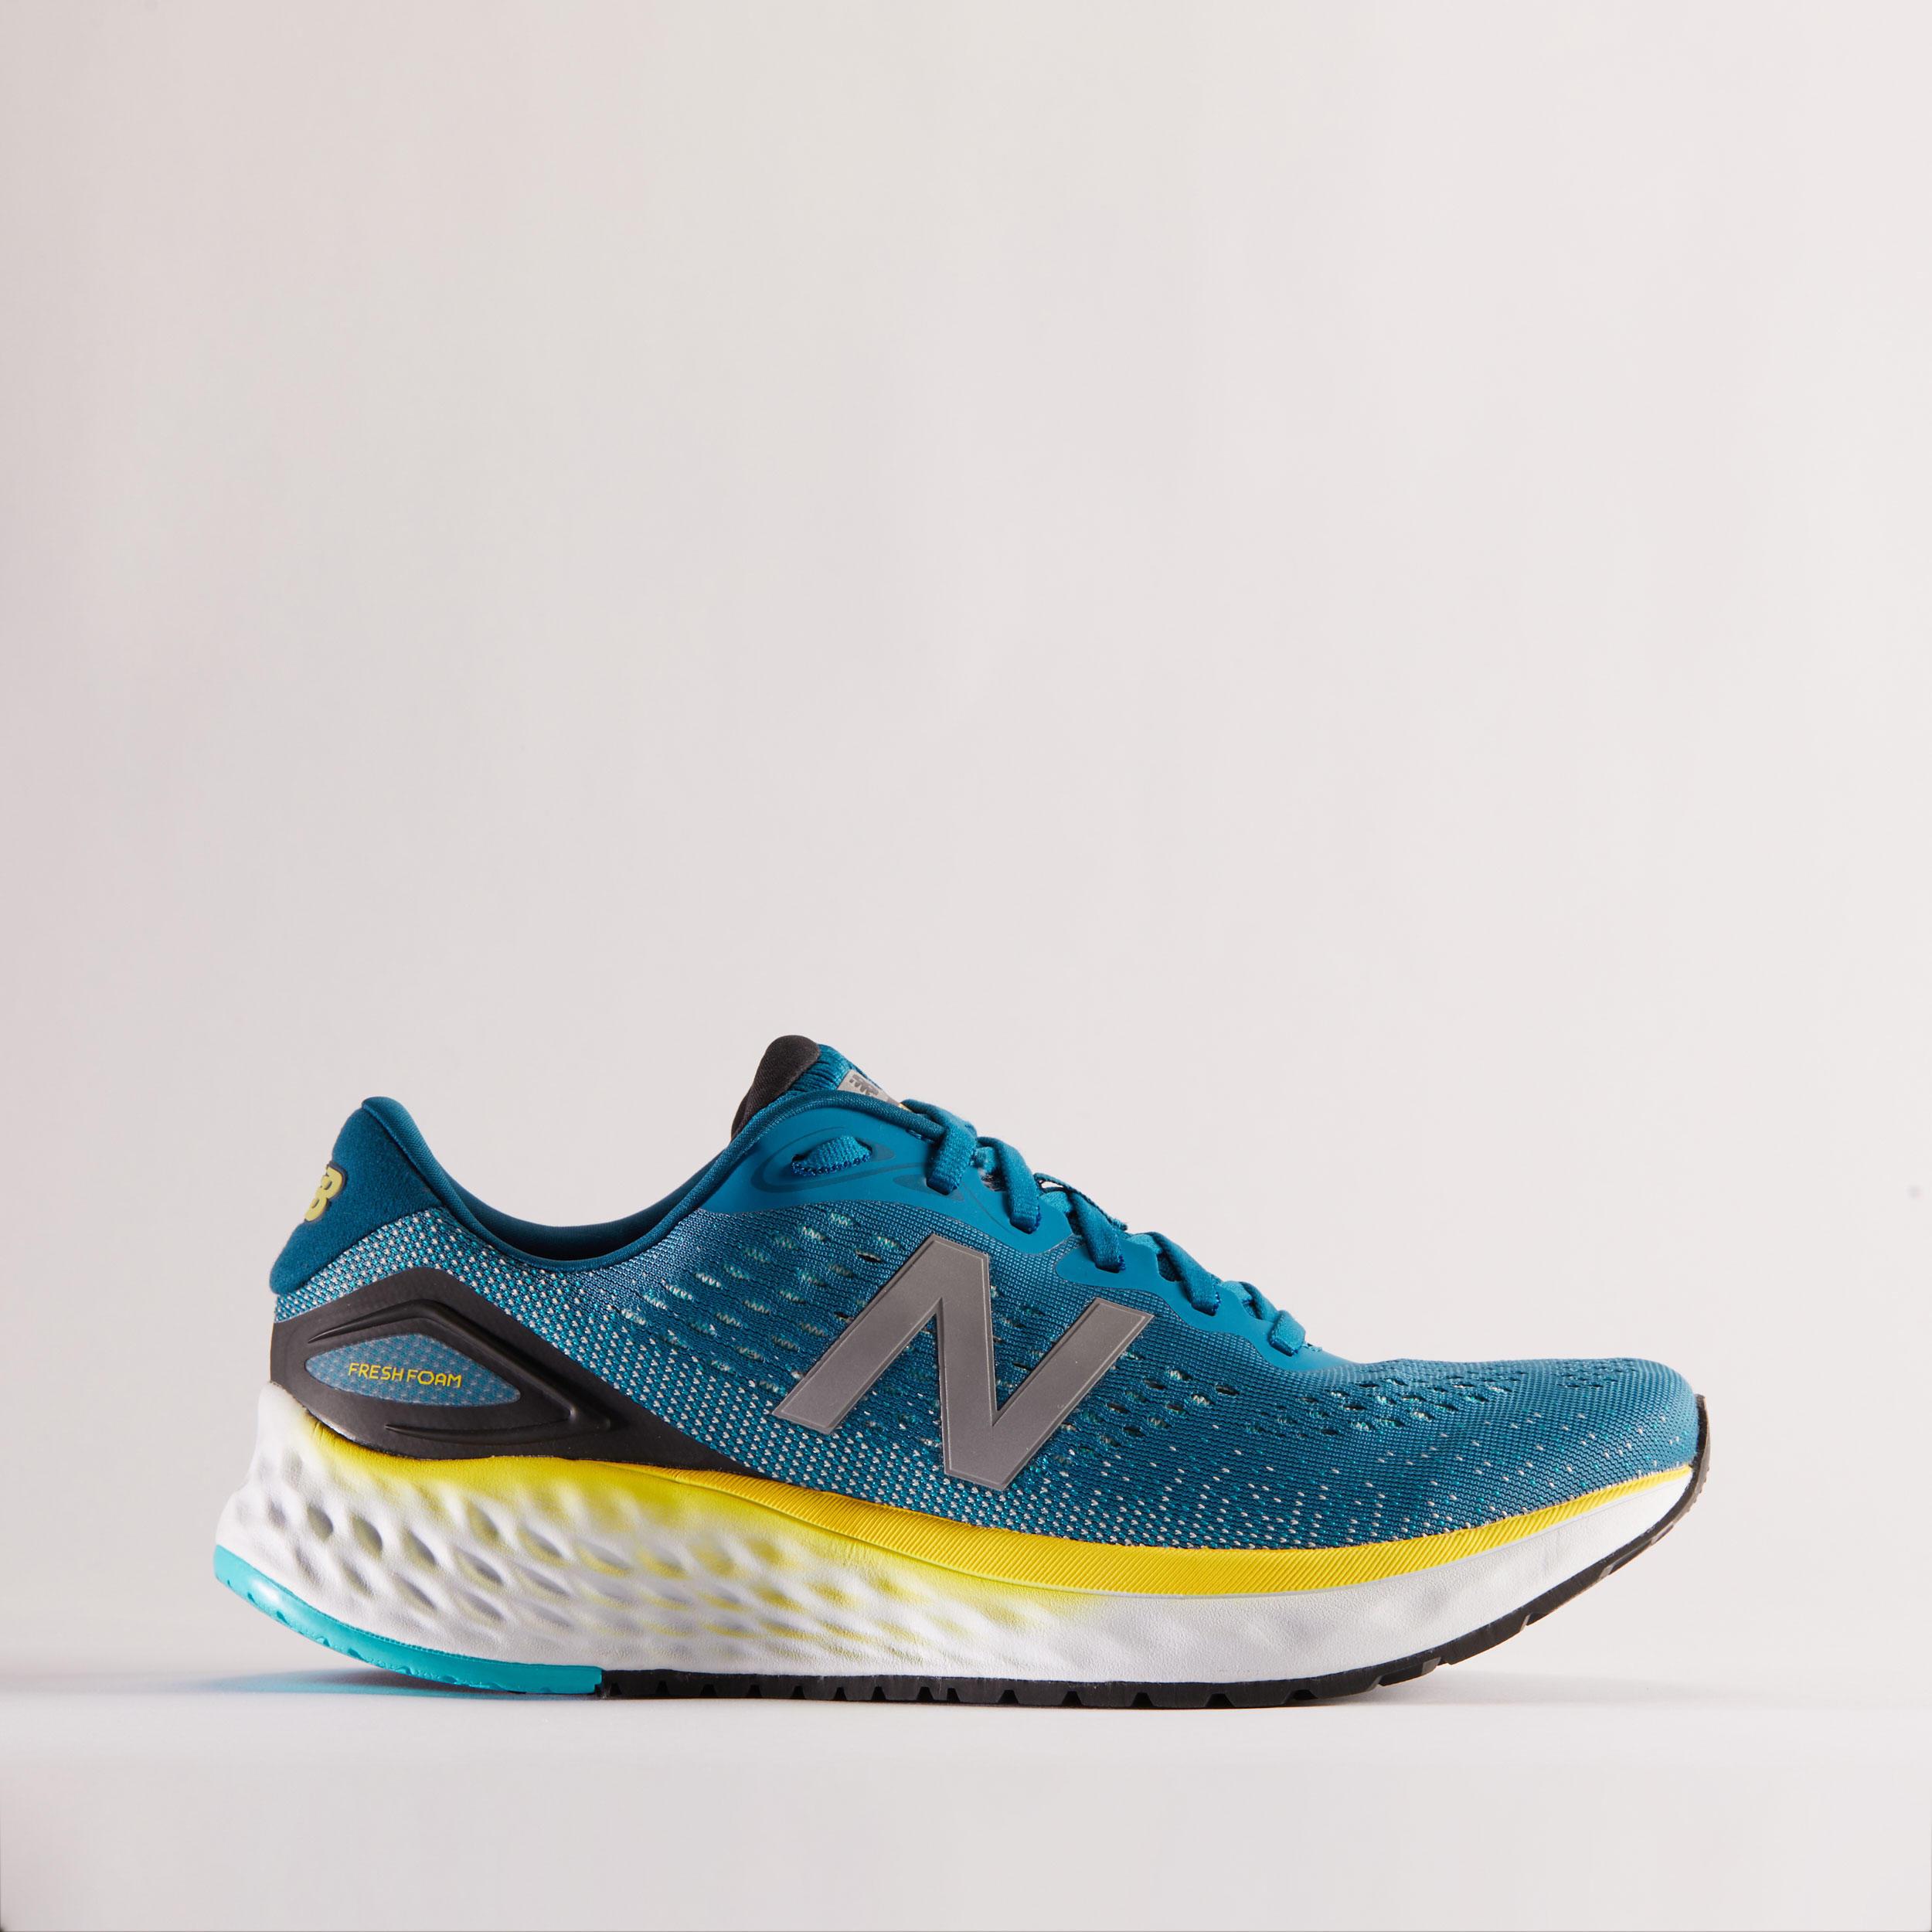 Chaussures running homme New balance | DECATHLON | Decathlon